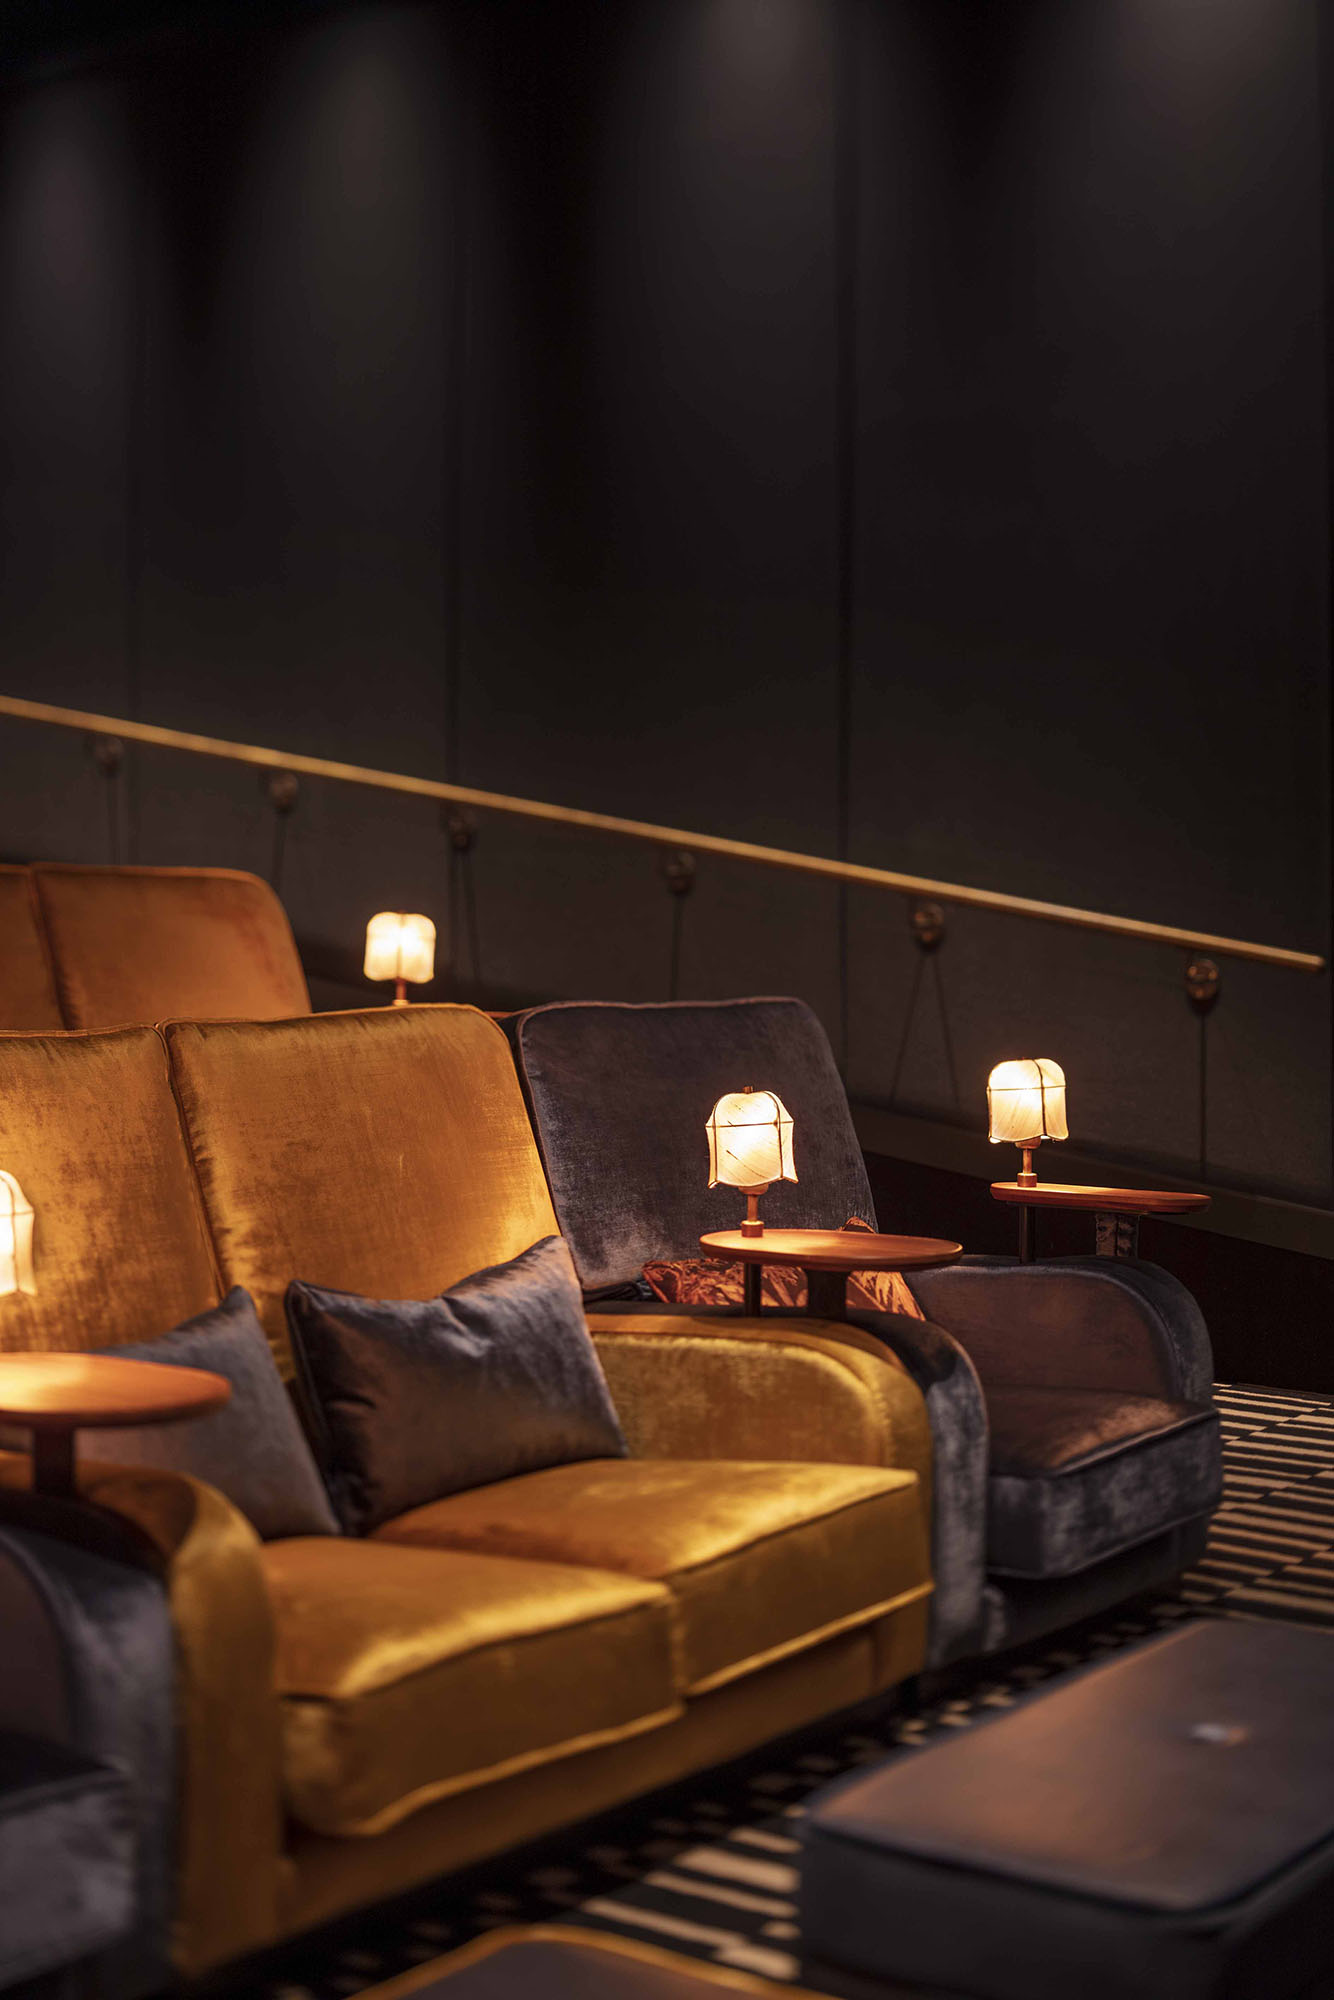 tivoli-screening-room-cinema-lighting-boutique-design-bath - Run For